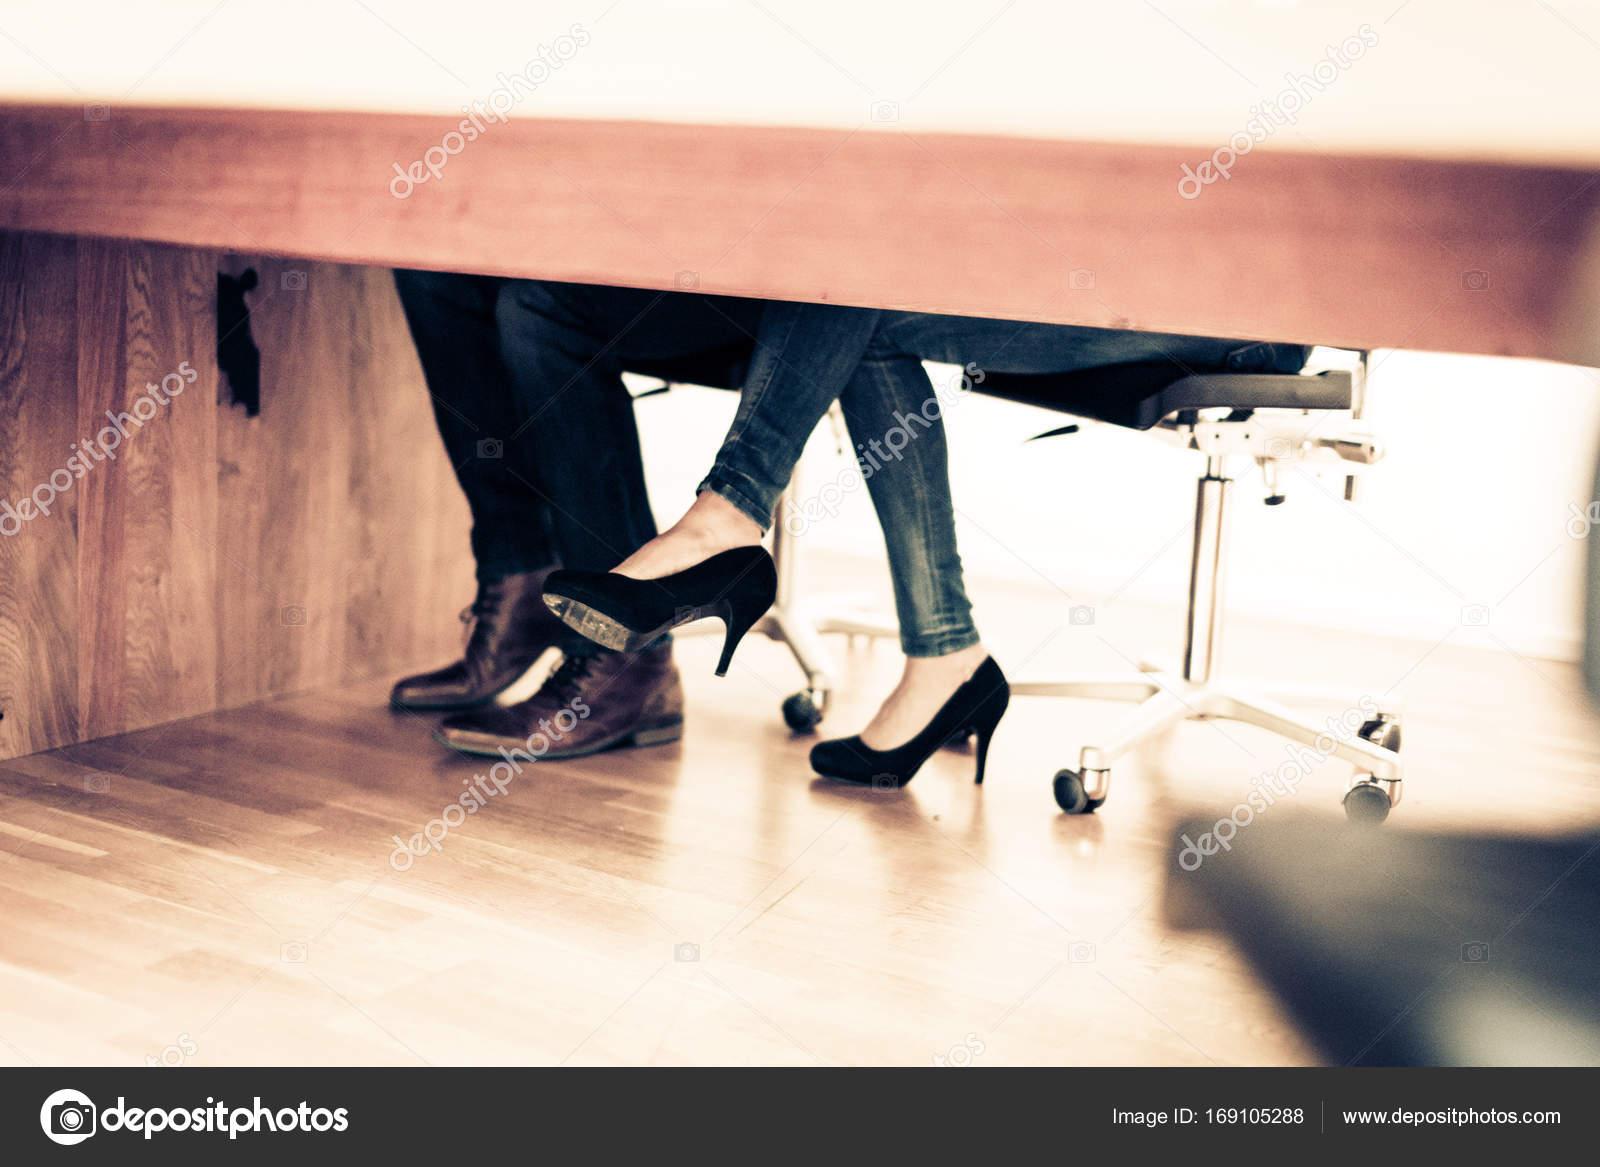 Feet under the table